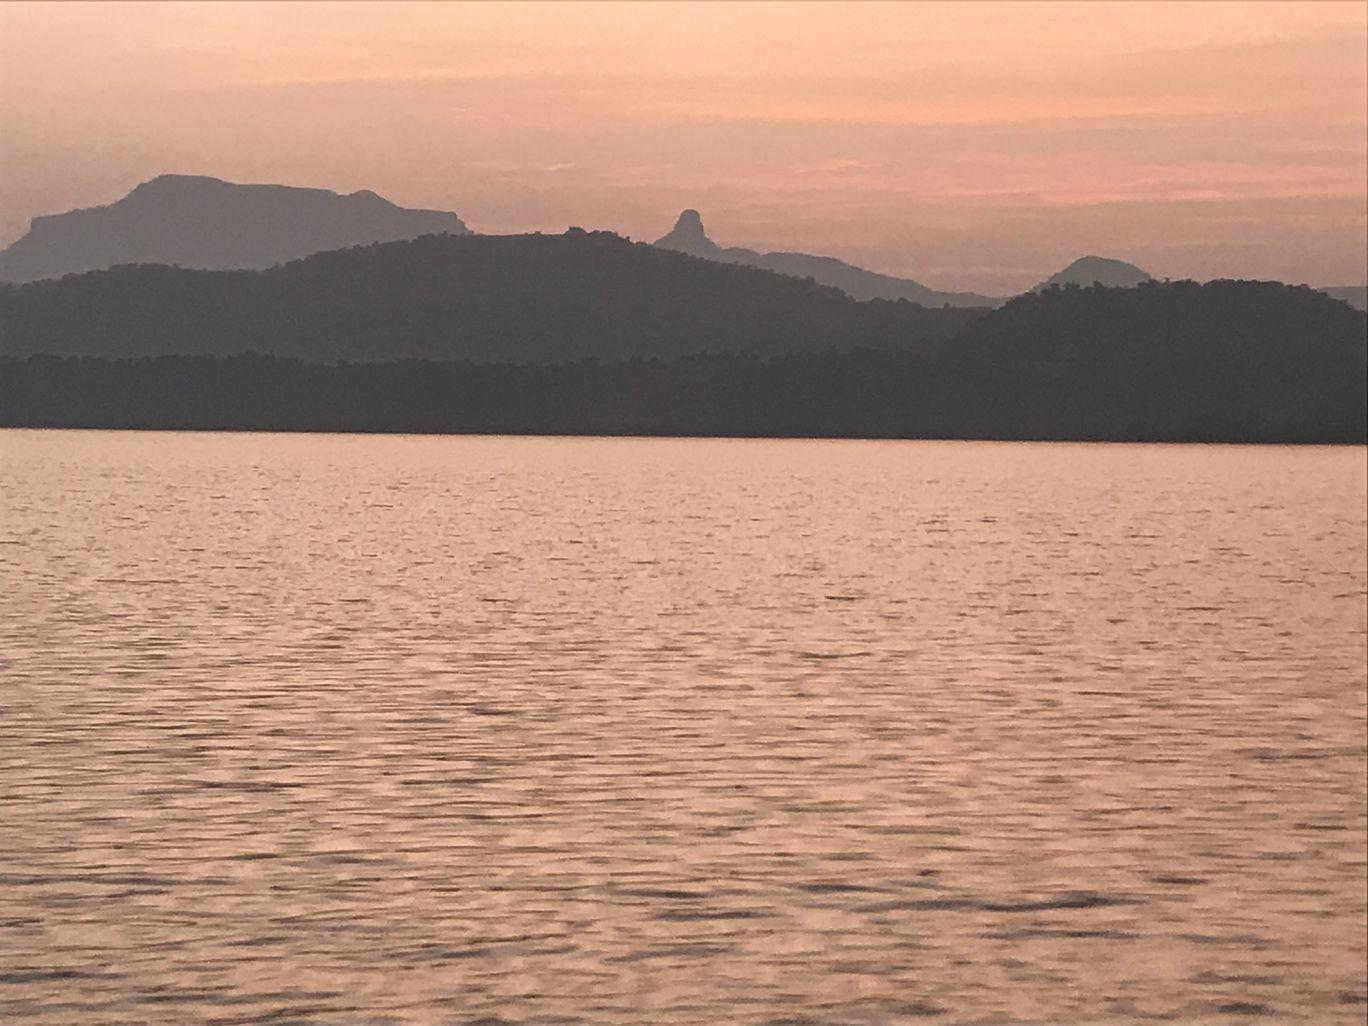 Photo of Bhandardara Lakeside Camping By Road Runner